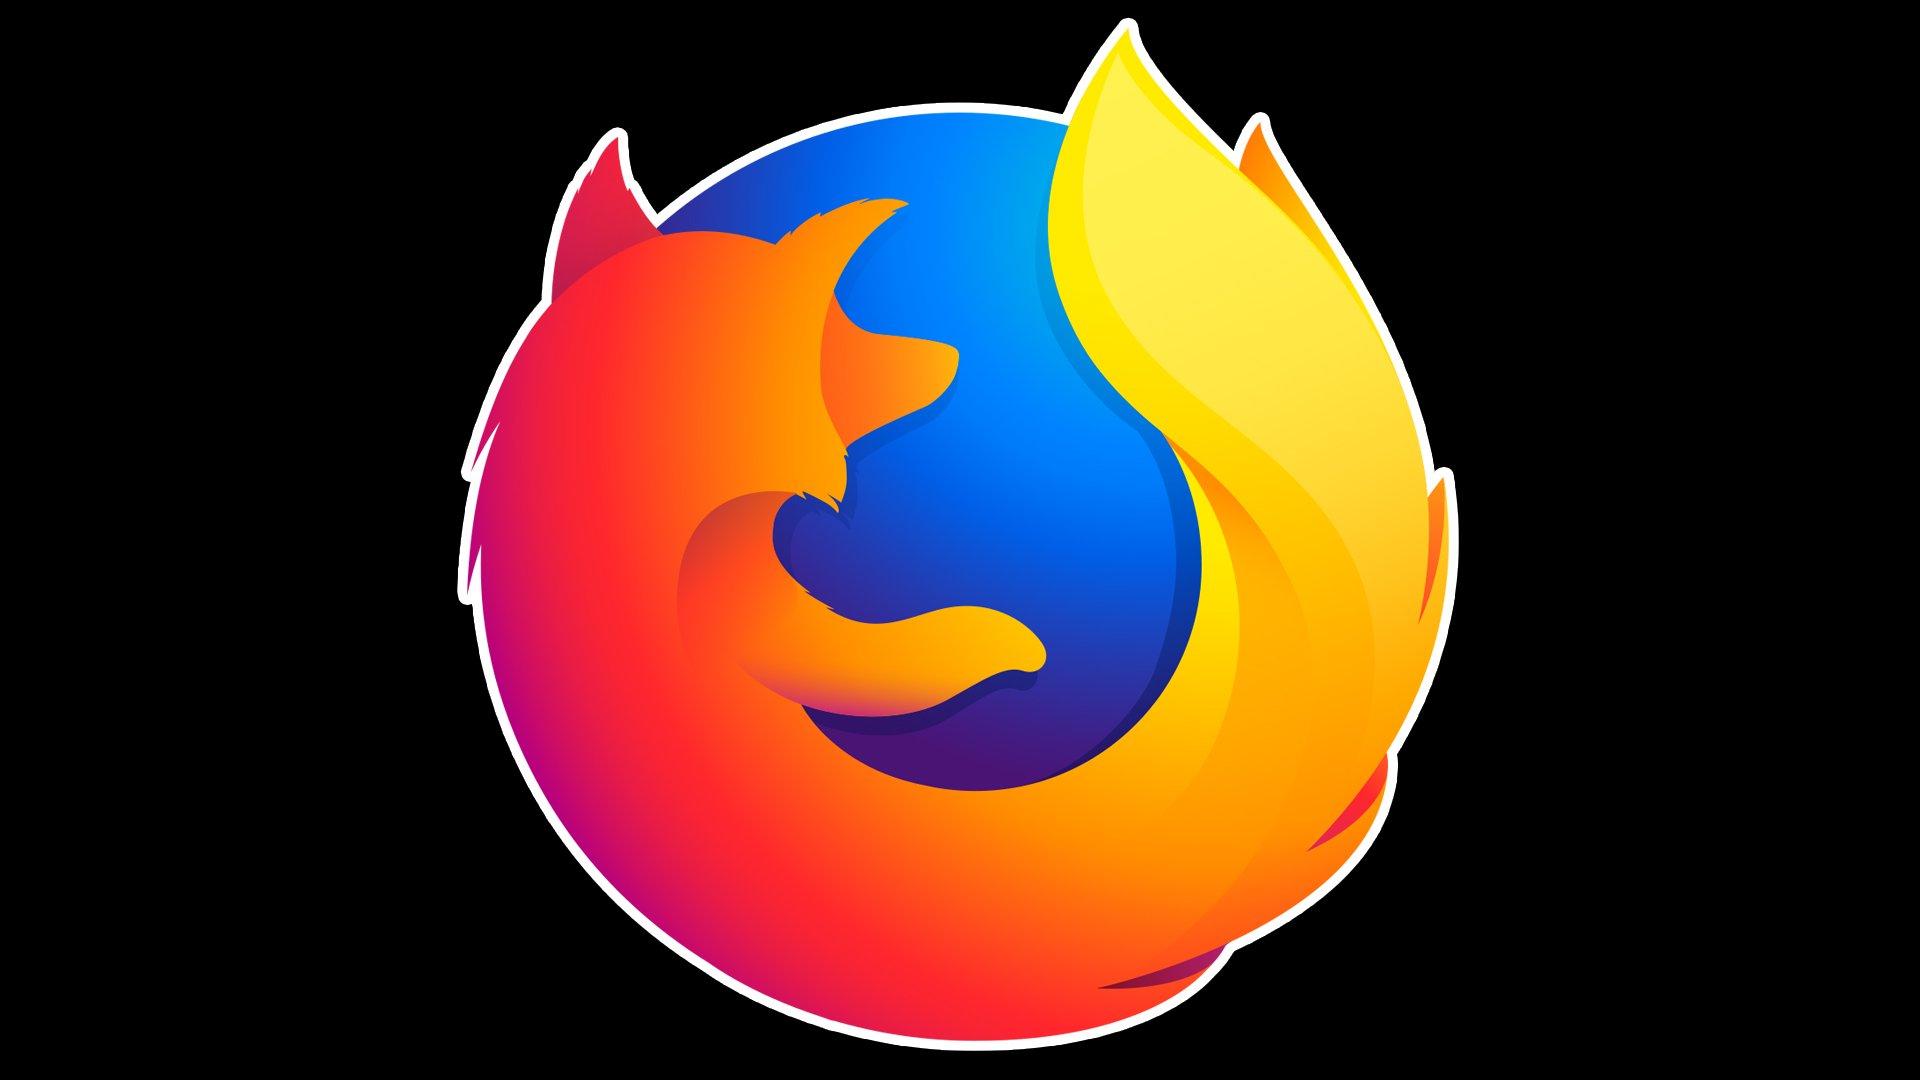 Mozilla Firefox Logo, Mozilla Firefox Symbol, Meaning ...  Mozilla Firefox...